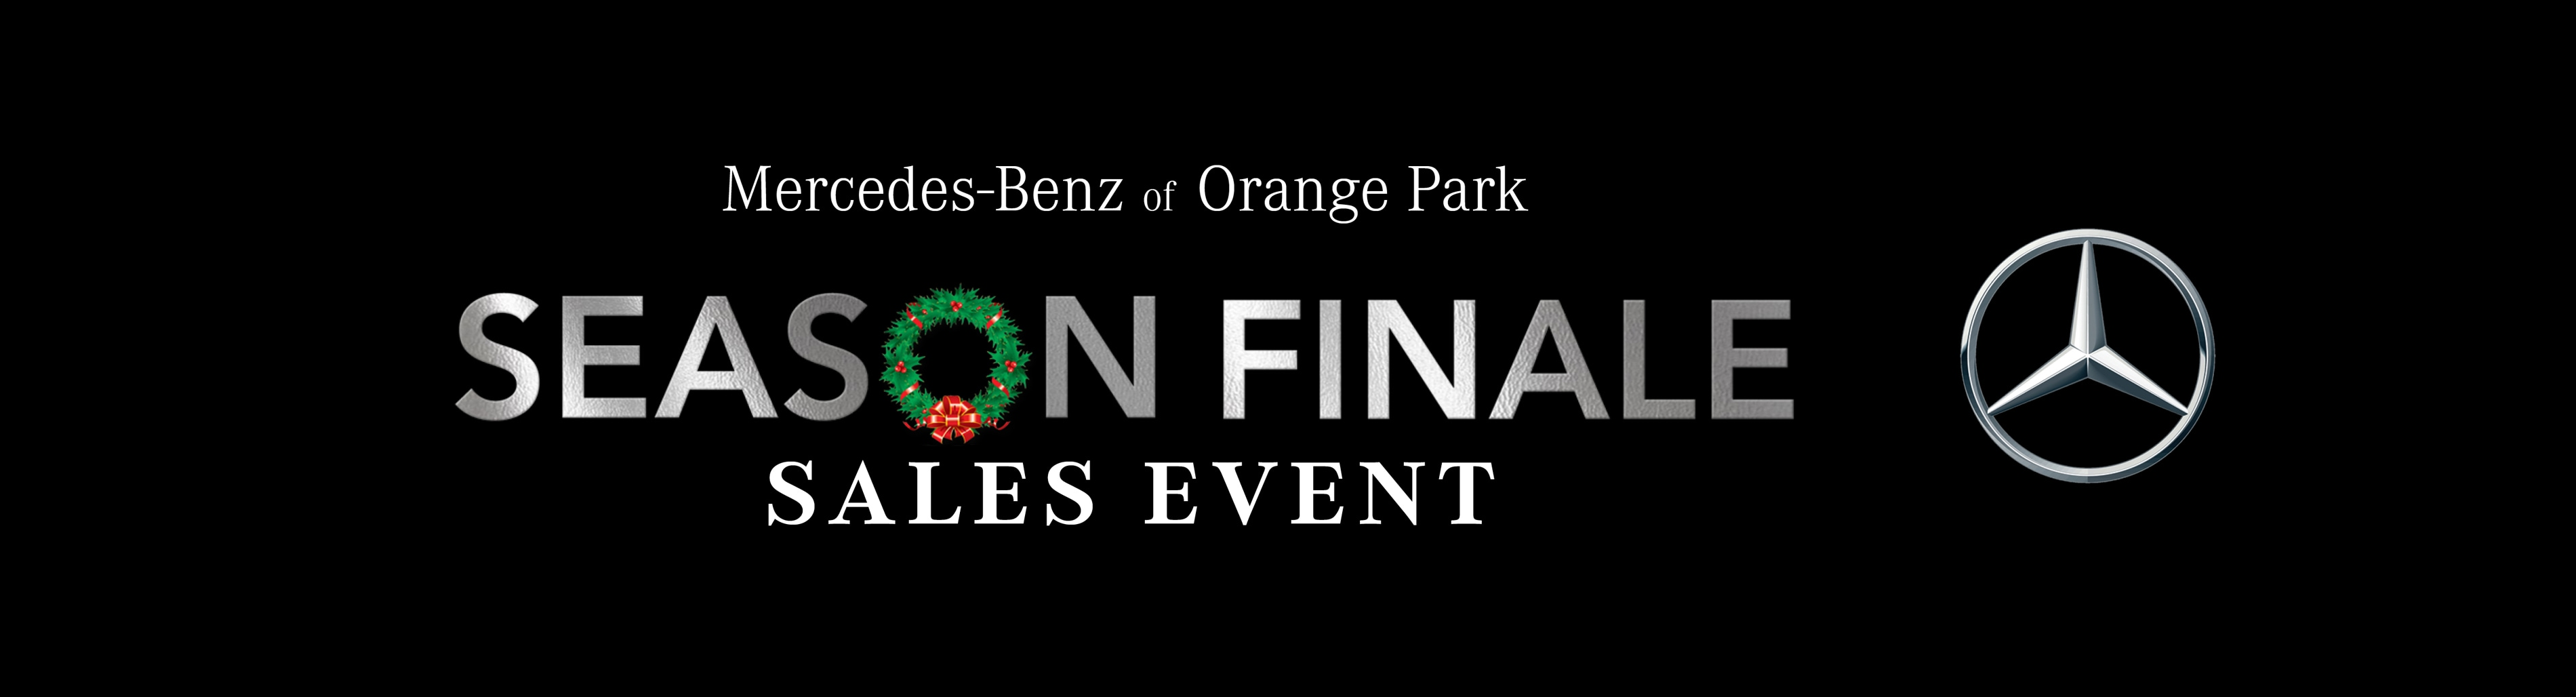 Top of mercedes benz parts jacksonville fl fiat world for Mercedes benz of orange park florida